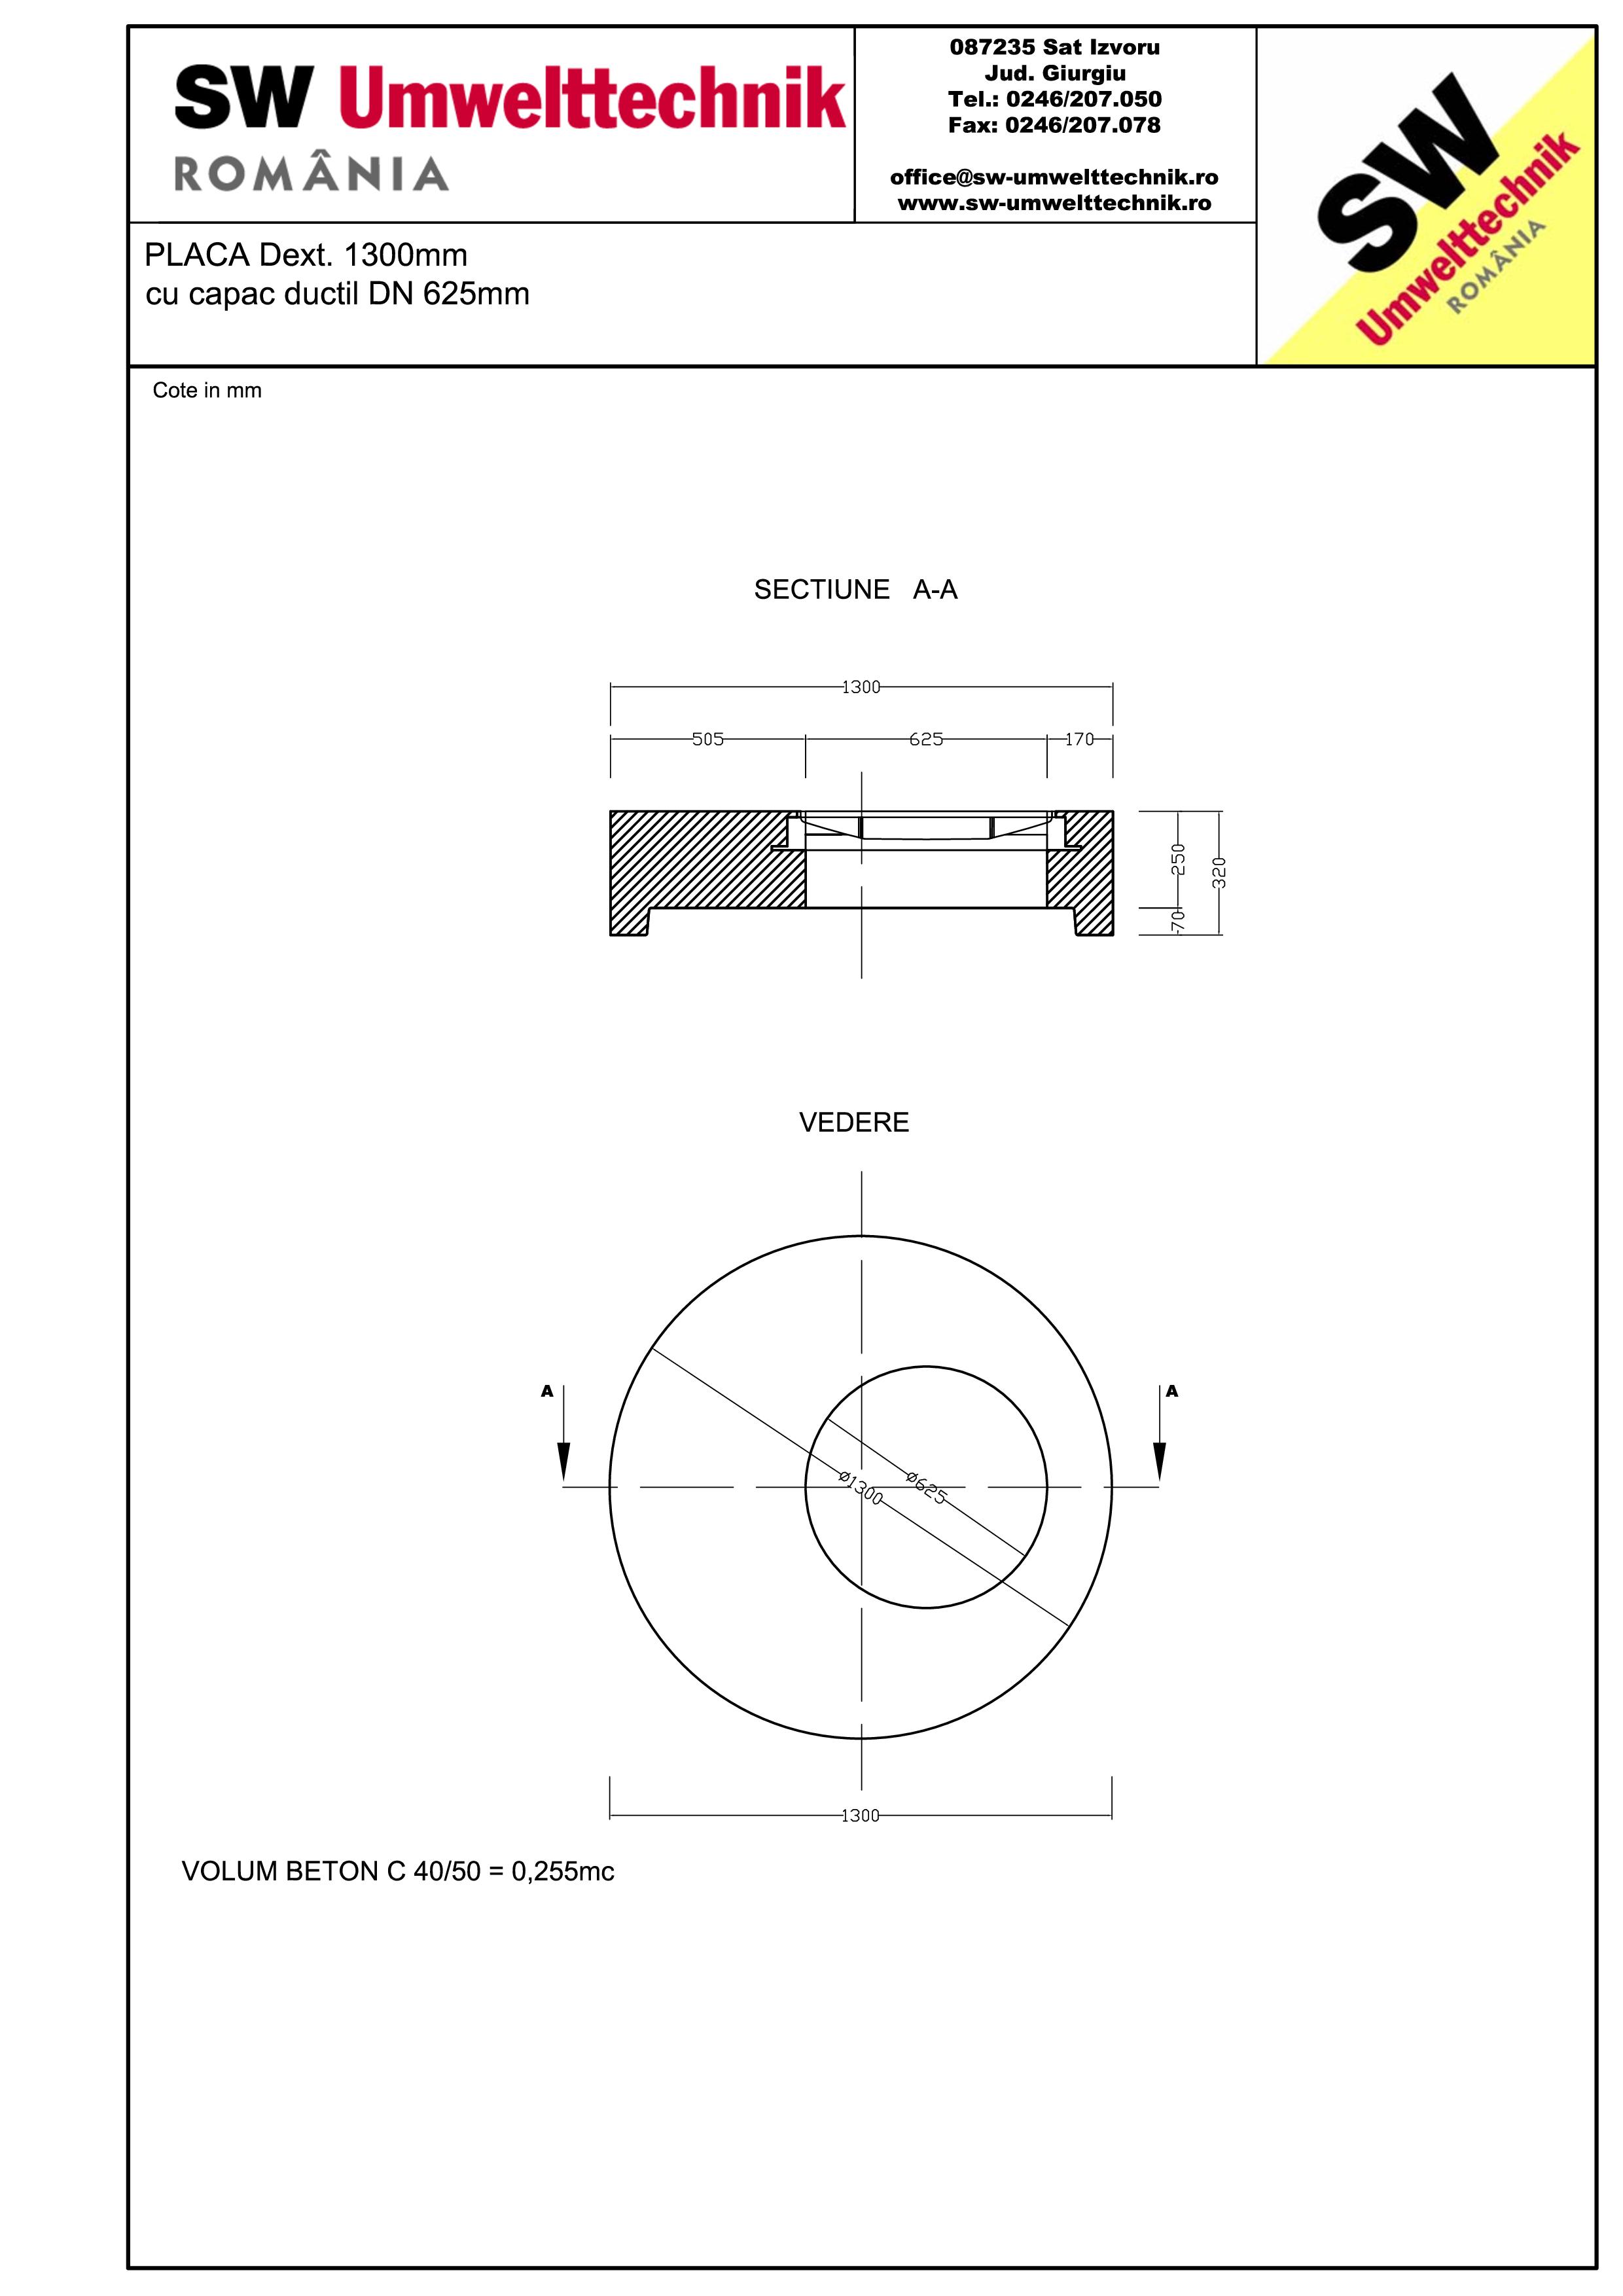 Pagina 1 - CAD-PDF Placa Dext.1300 H250  cu capac ductil DN625 SW UMWELTTECHNIK Detaliu de produs